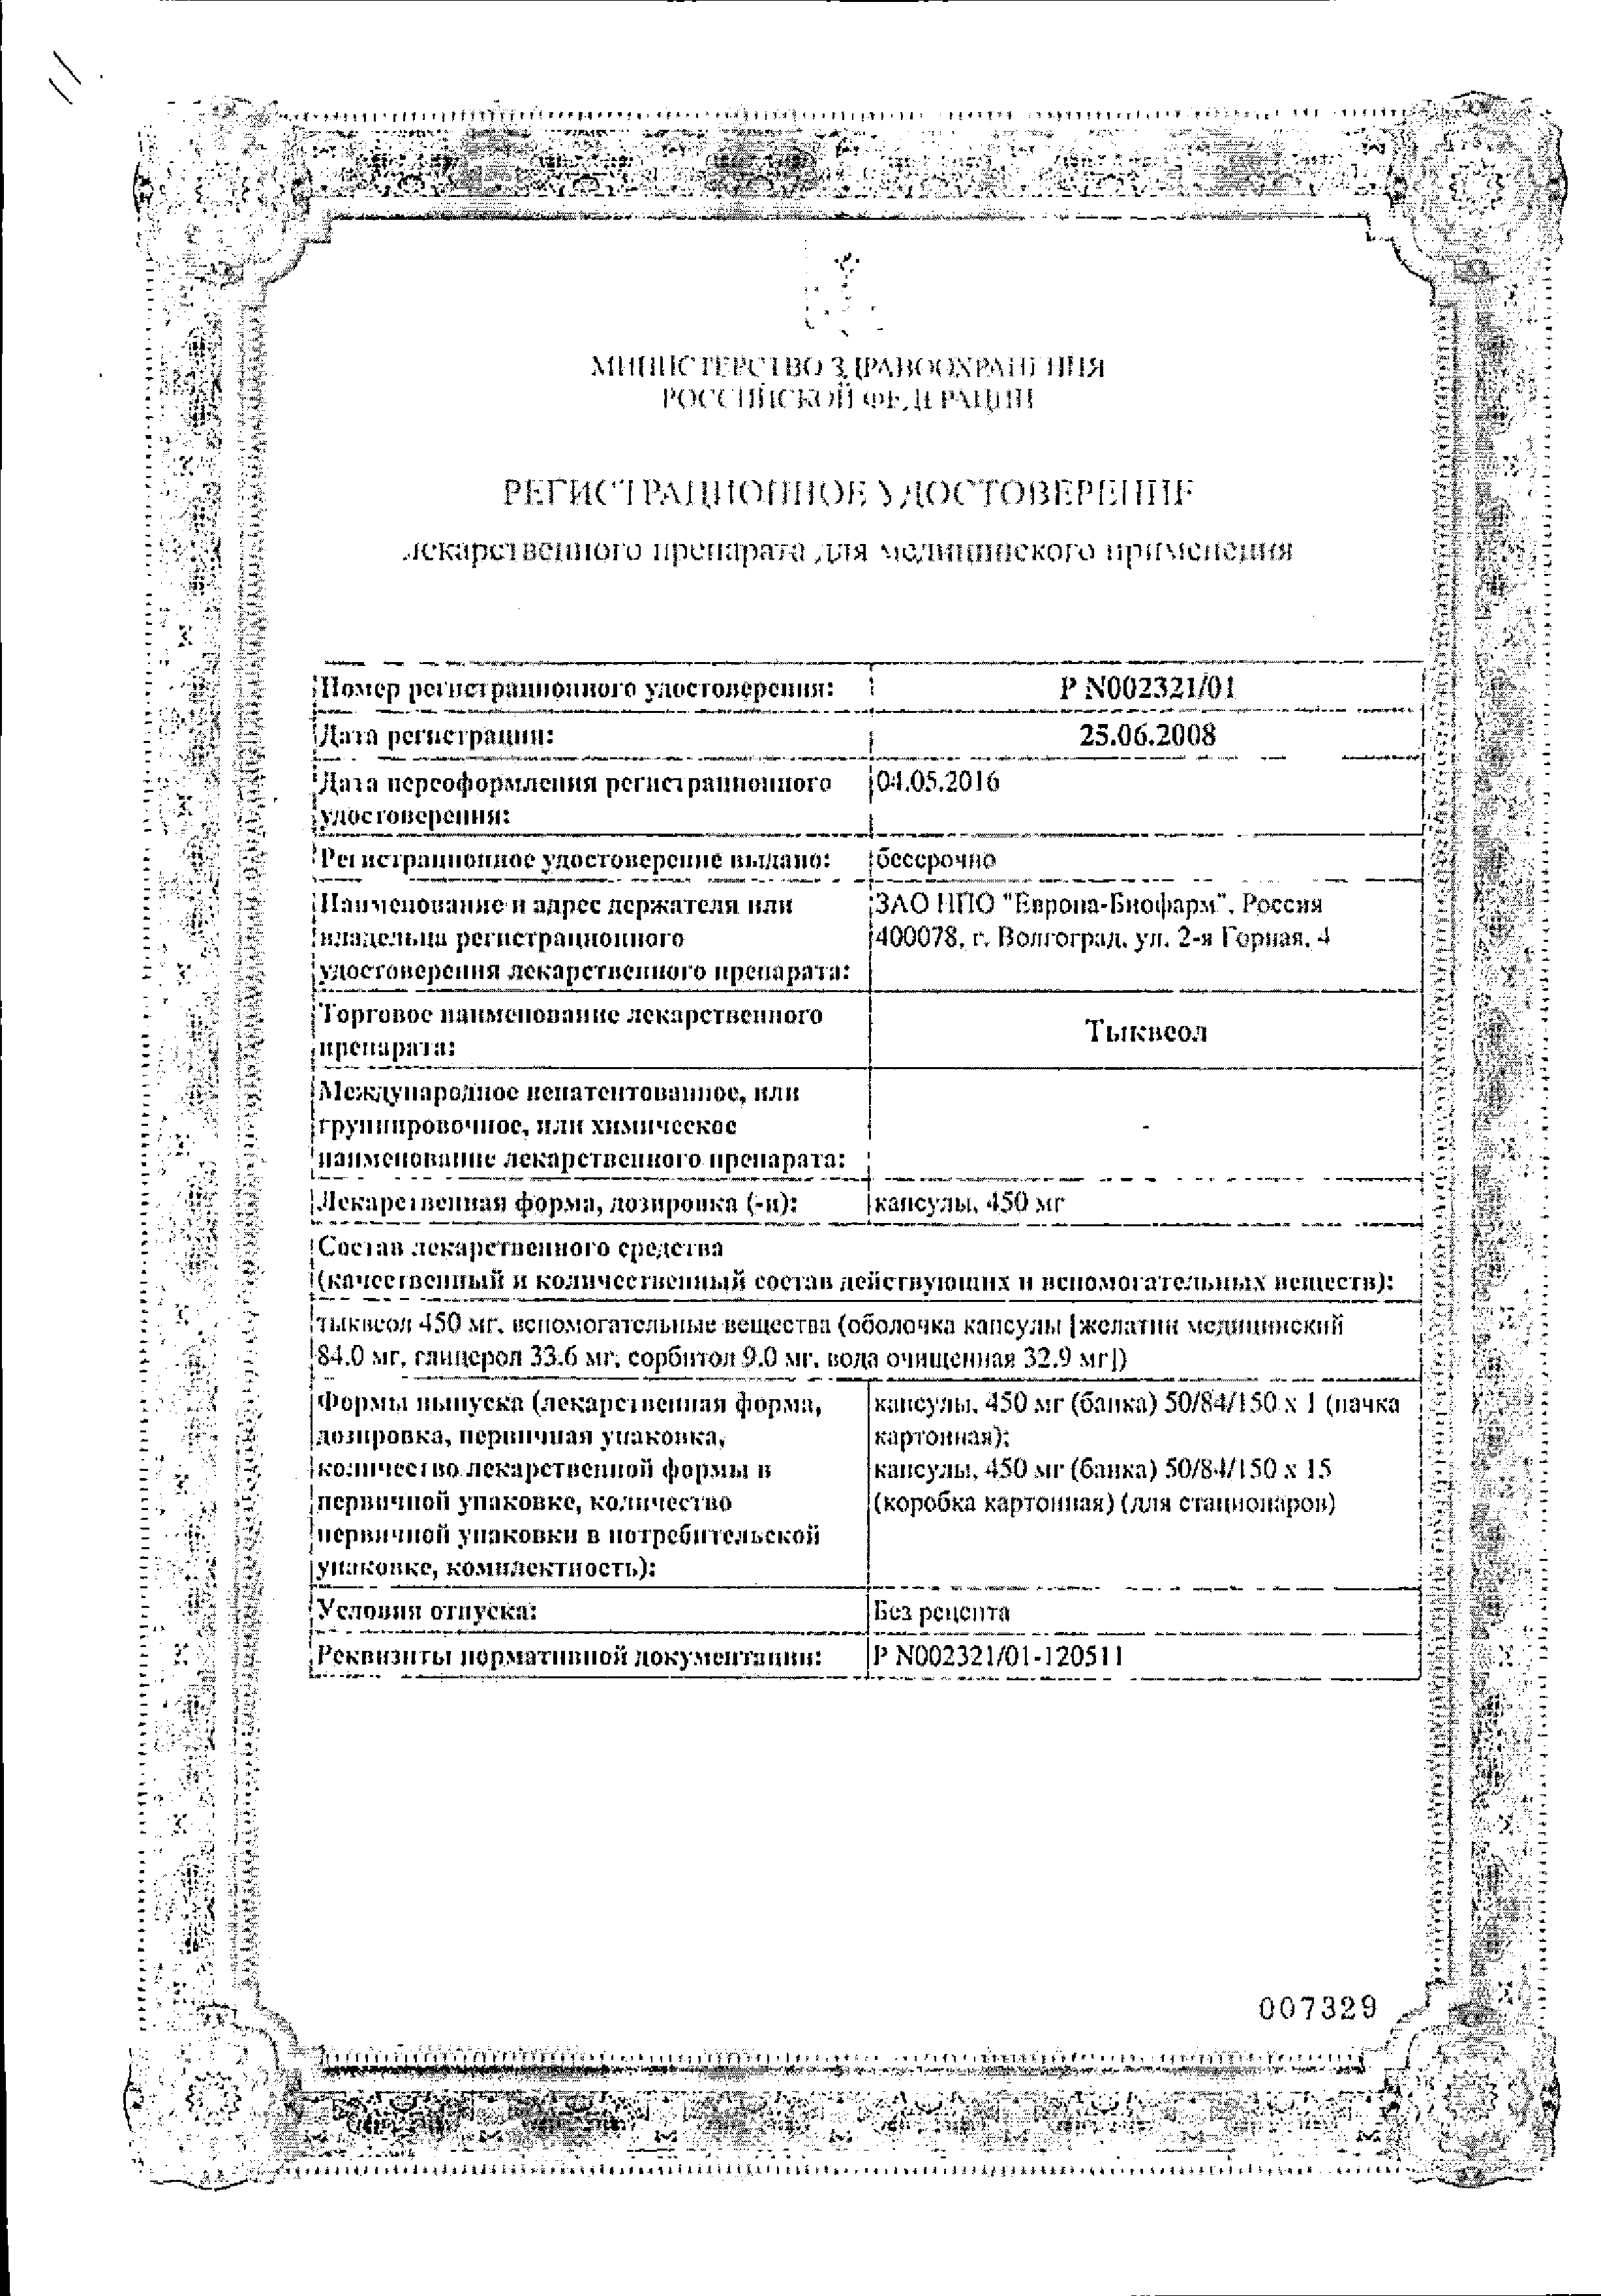 Тыквеол капсулы 450 мг сертификат